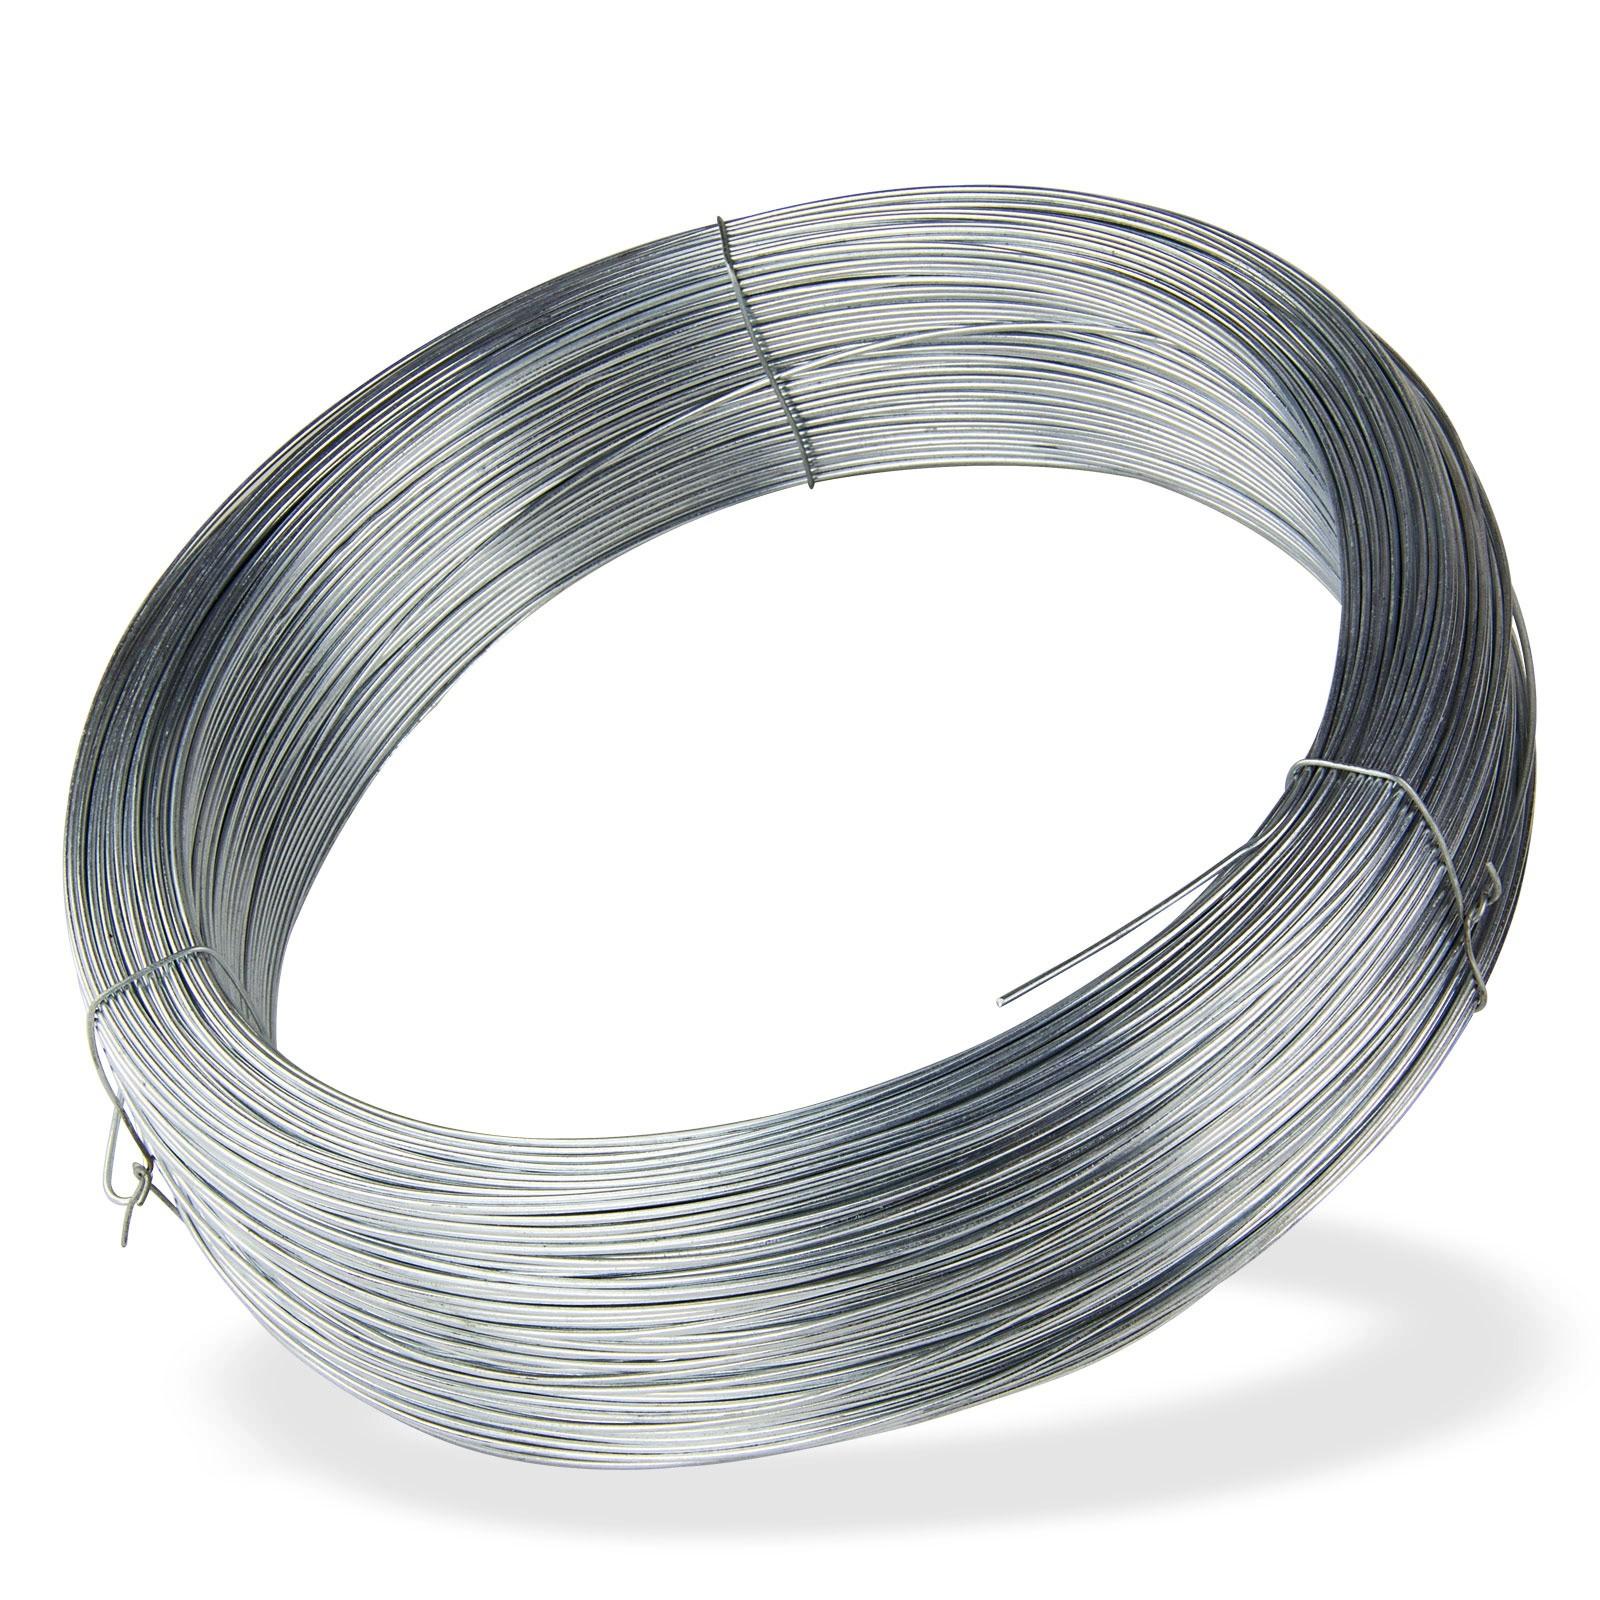 Draht / Bindedraht verzinkt 310 m x 1,6 mm 5 kg